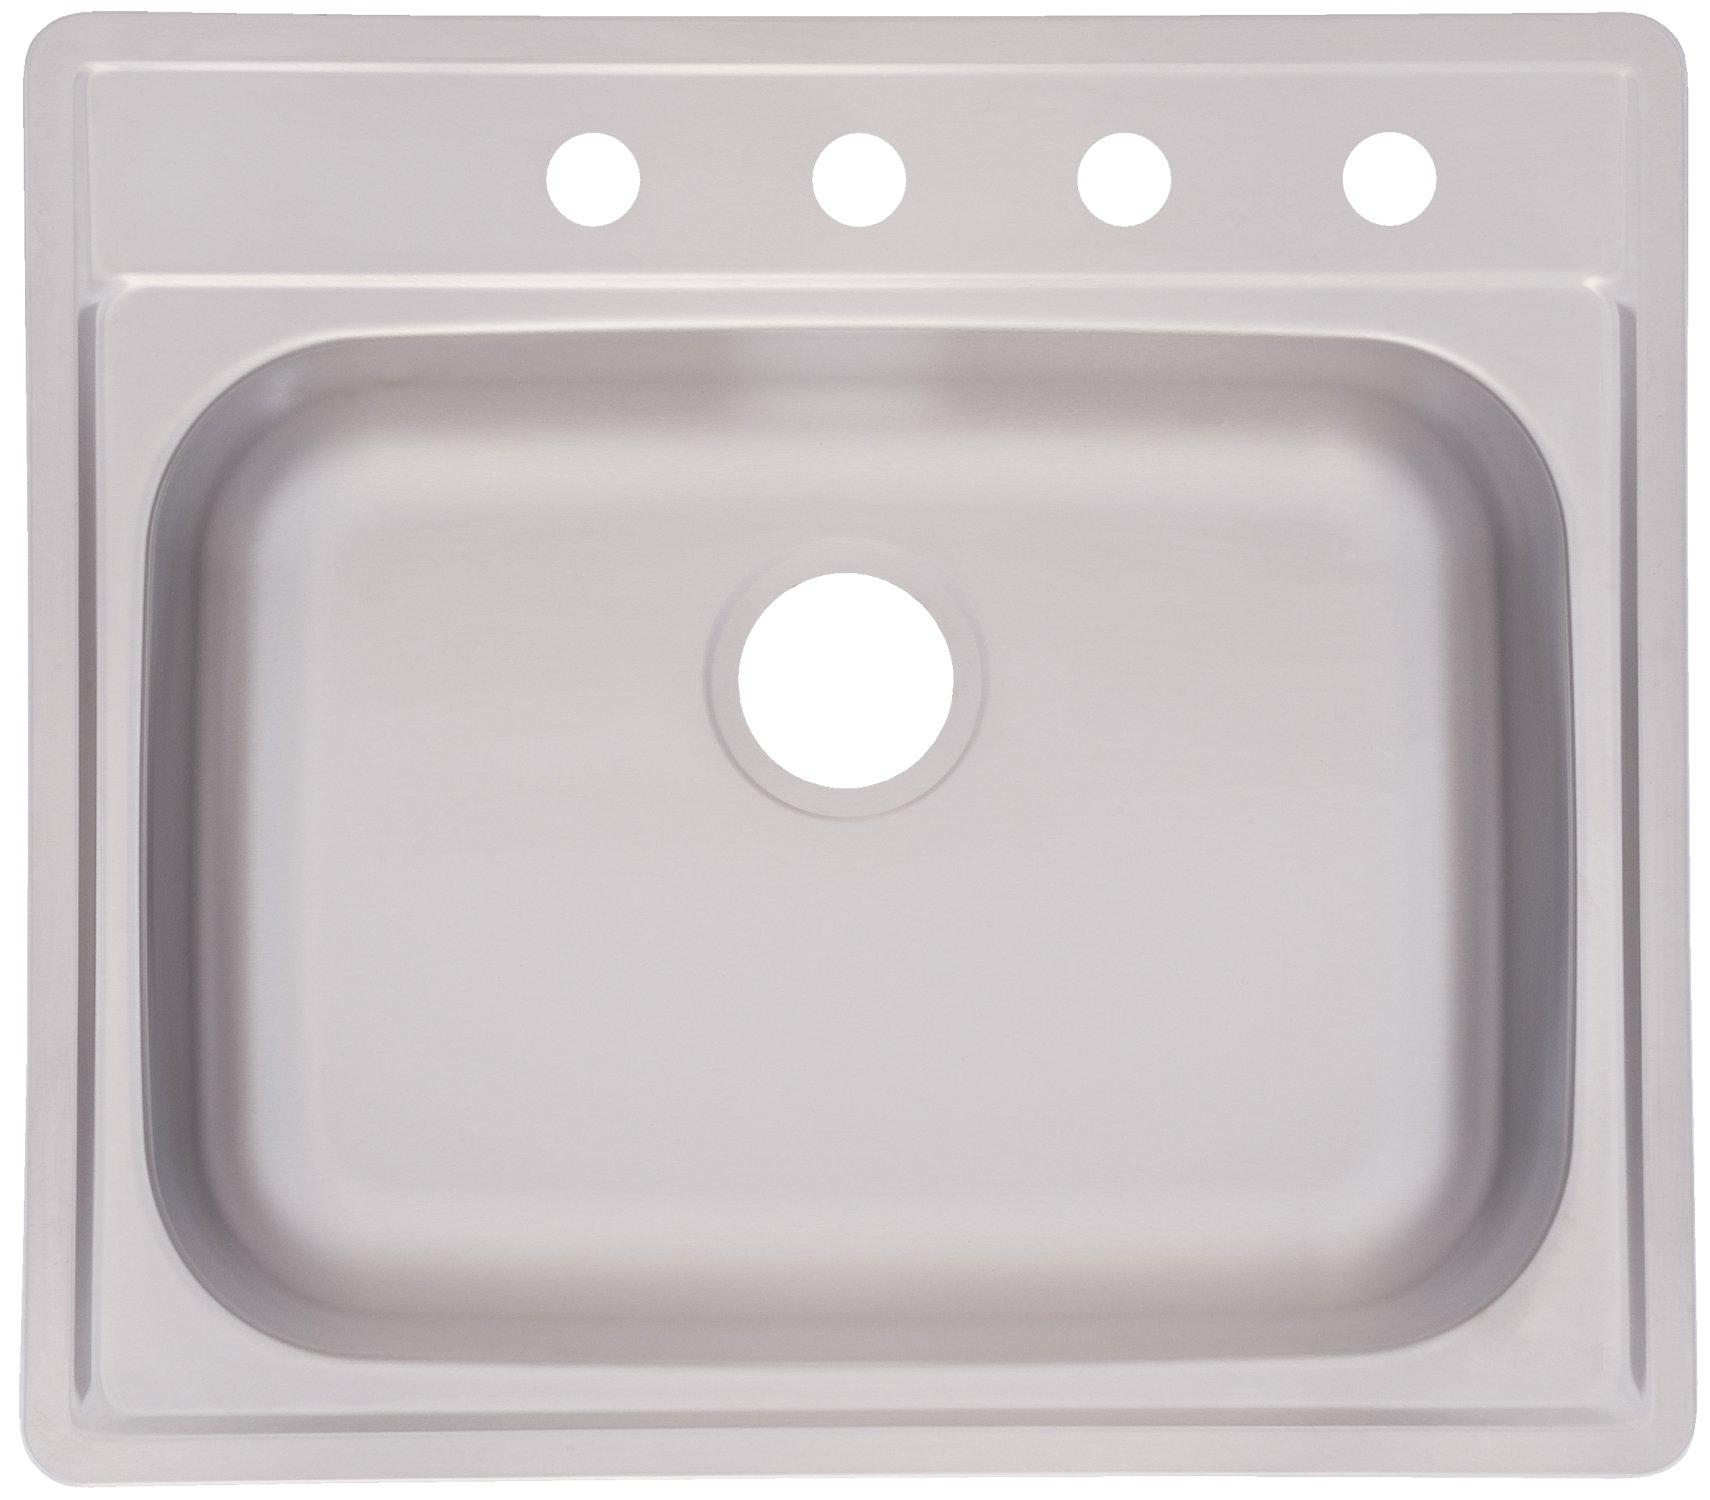 "Kindred FSS804NB Single Bowl Stainless Steel 25"" x 22"" in Topmount Sink"